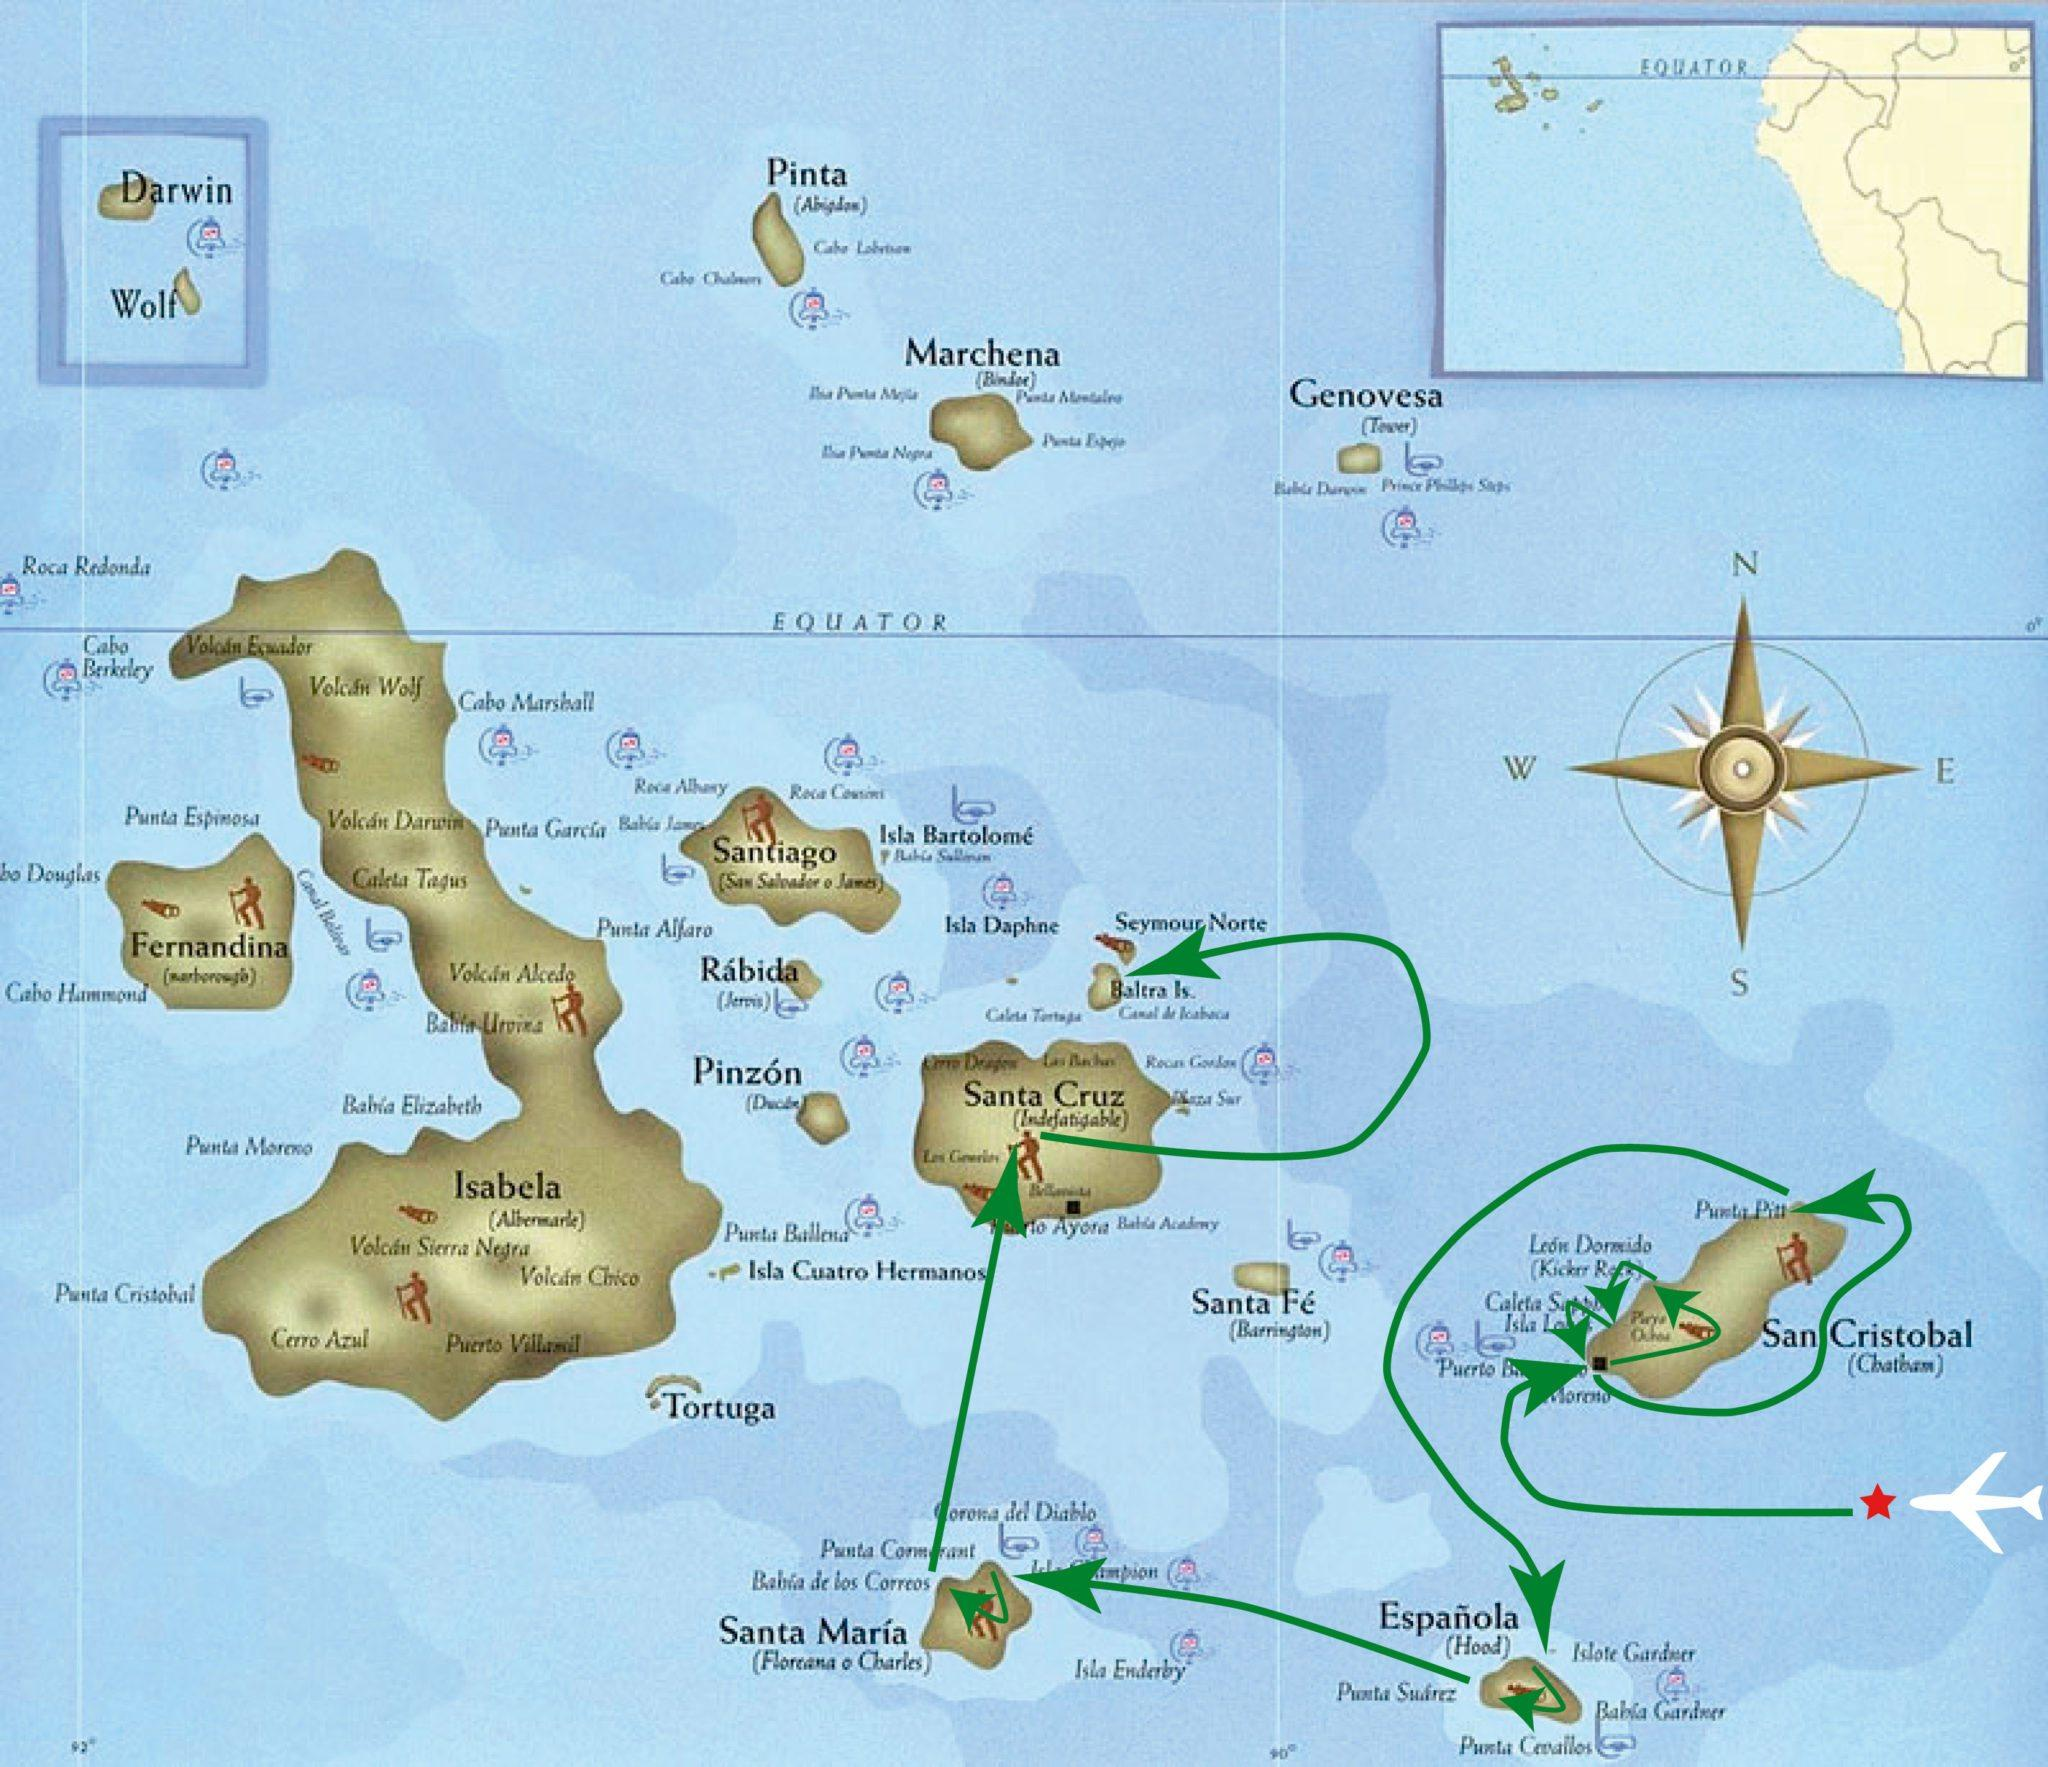 Galapagos Inca Trail To Machu Picchu And Easter Island Tour